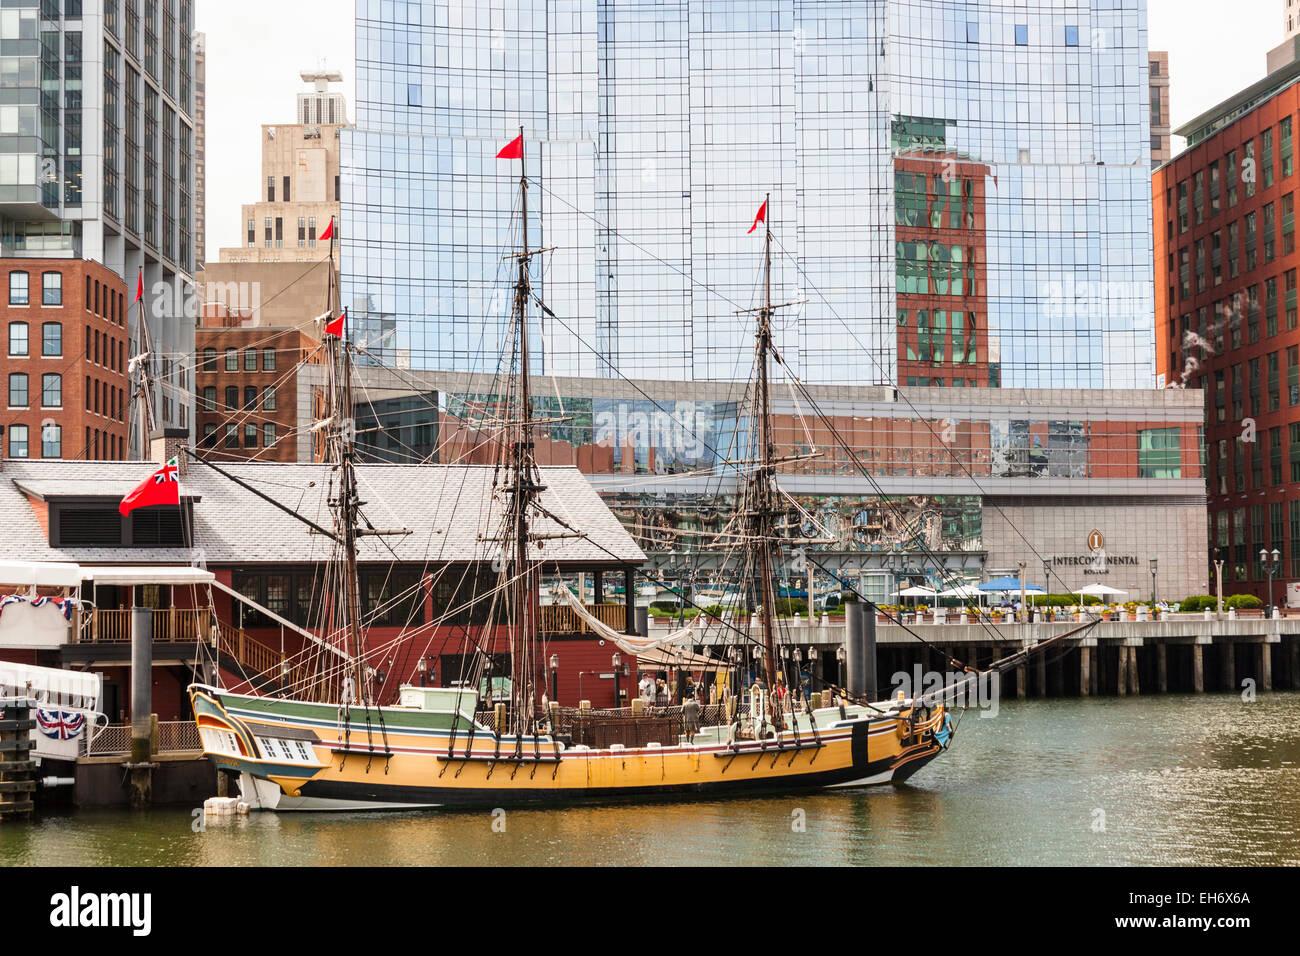 Eleanor, one of the Boston Tea Party ships, Boston Tea Party Museum, Intercontinental Hotel, Boston, Massachusetts, - Stock Image